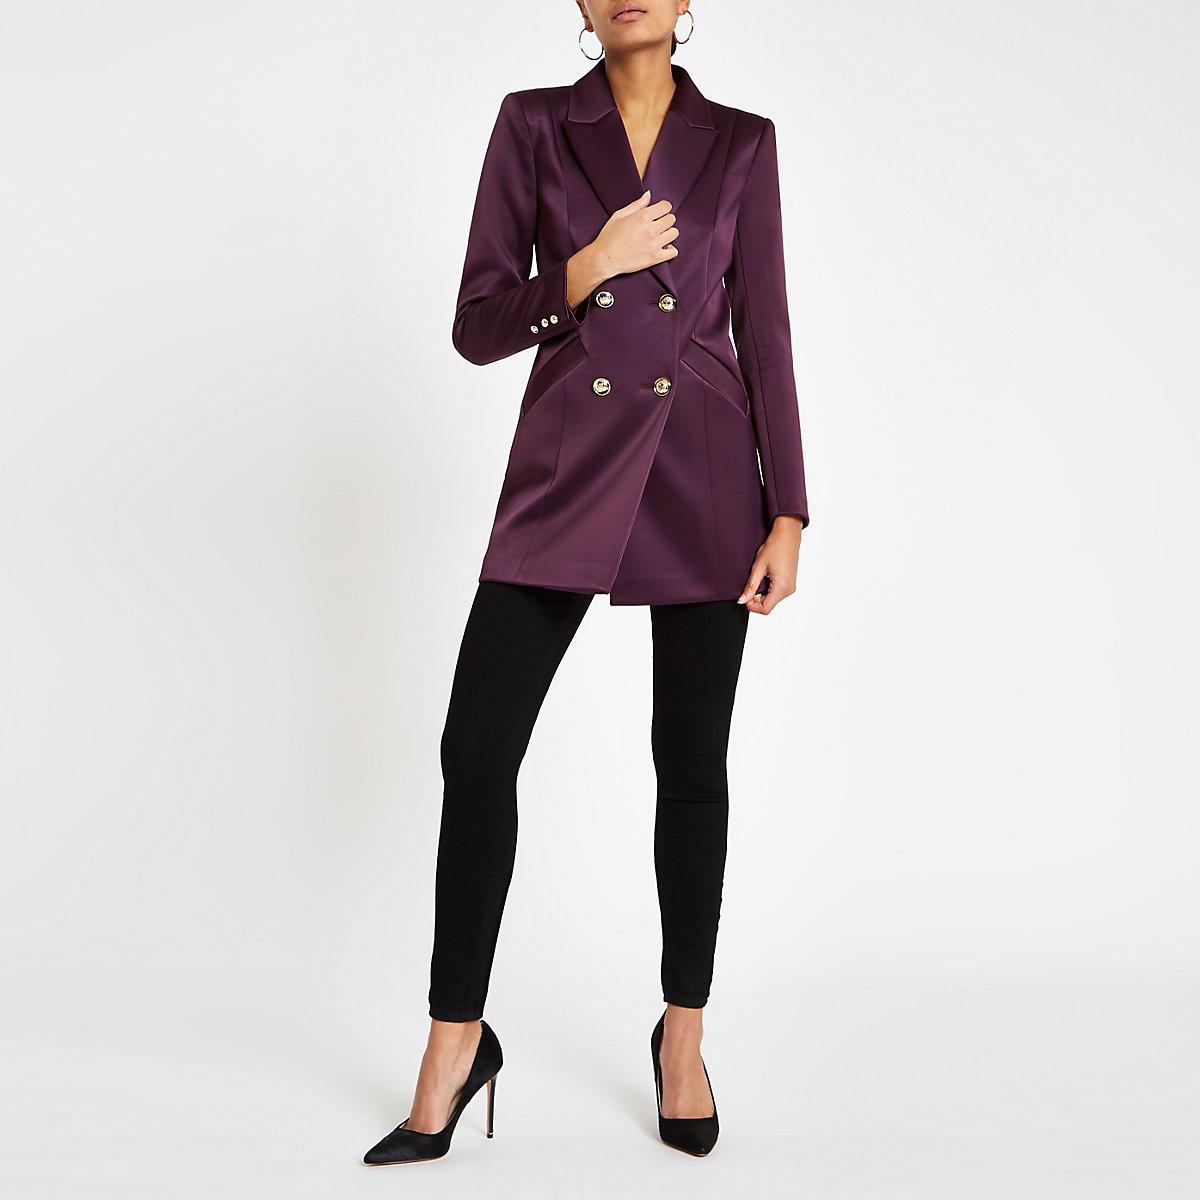 Purple satin double breasted blazer